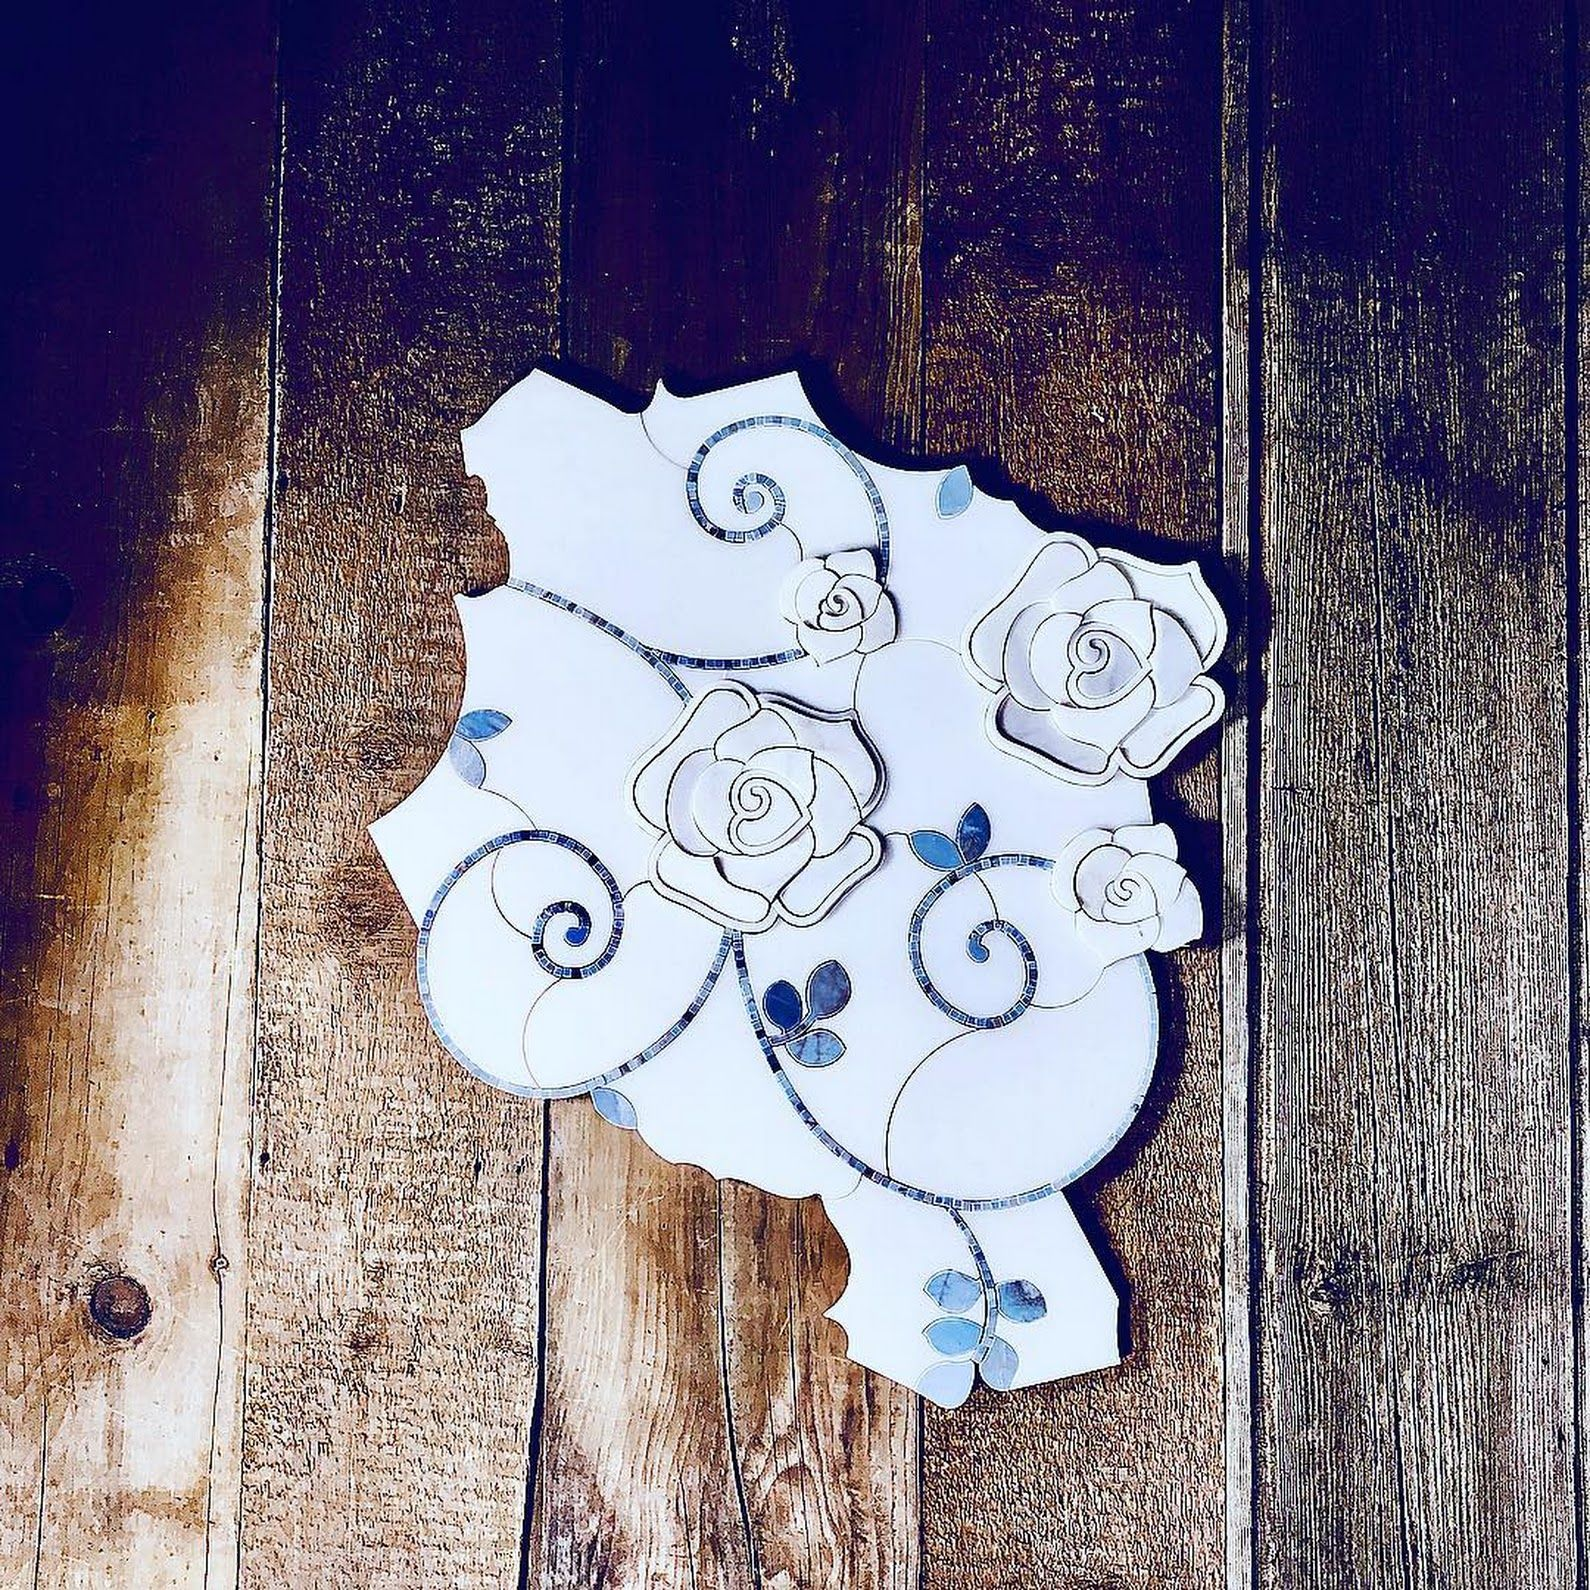 Pin by TileBuys on Waterjet Mosaic Tile Sale | Pinterest | Luxury ...